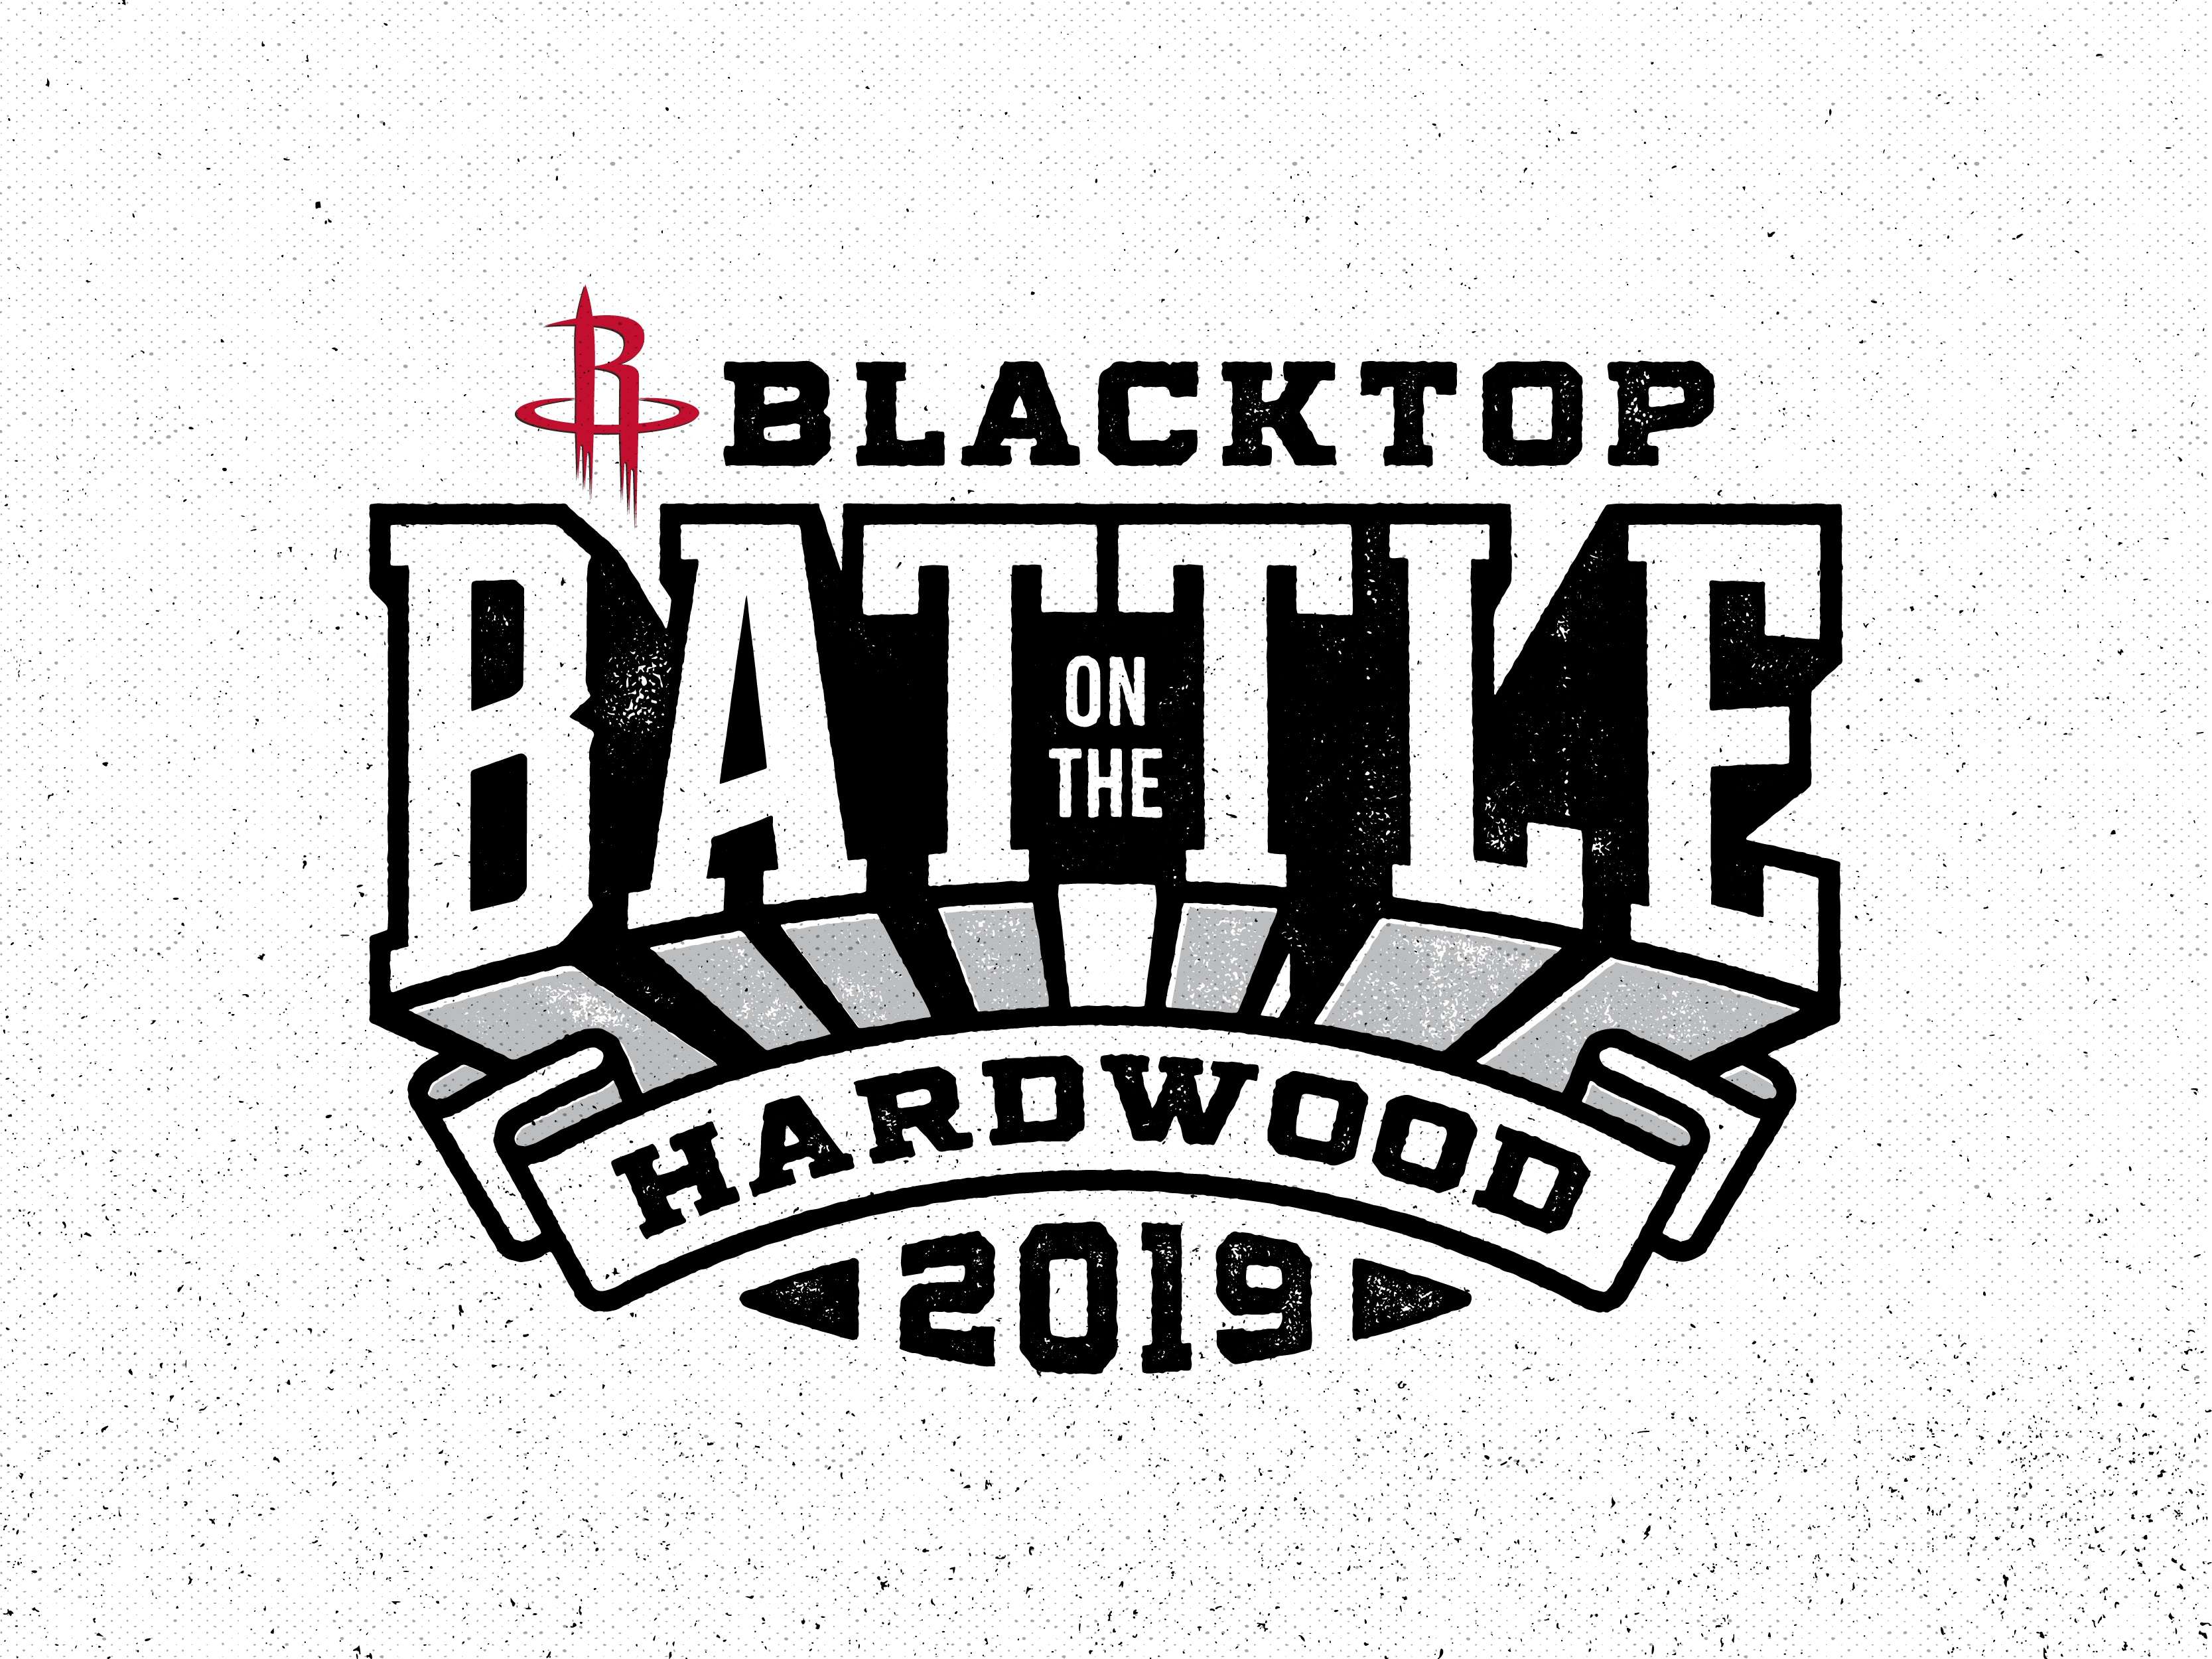 Blacktop battle 01